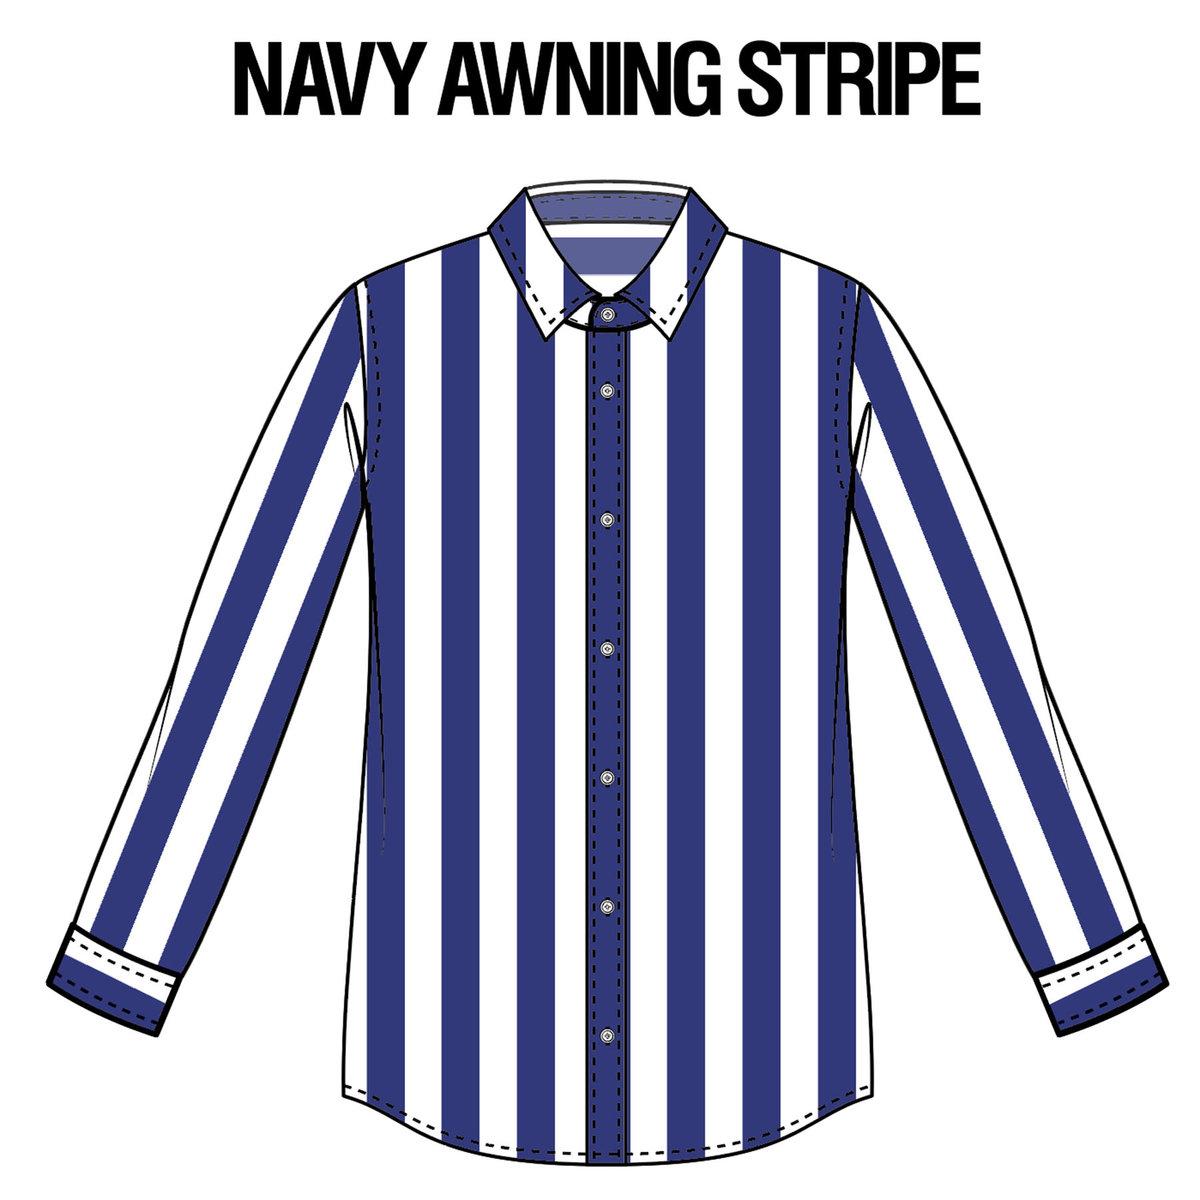 Navy Awning Stripe.jpg